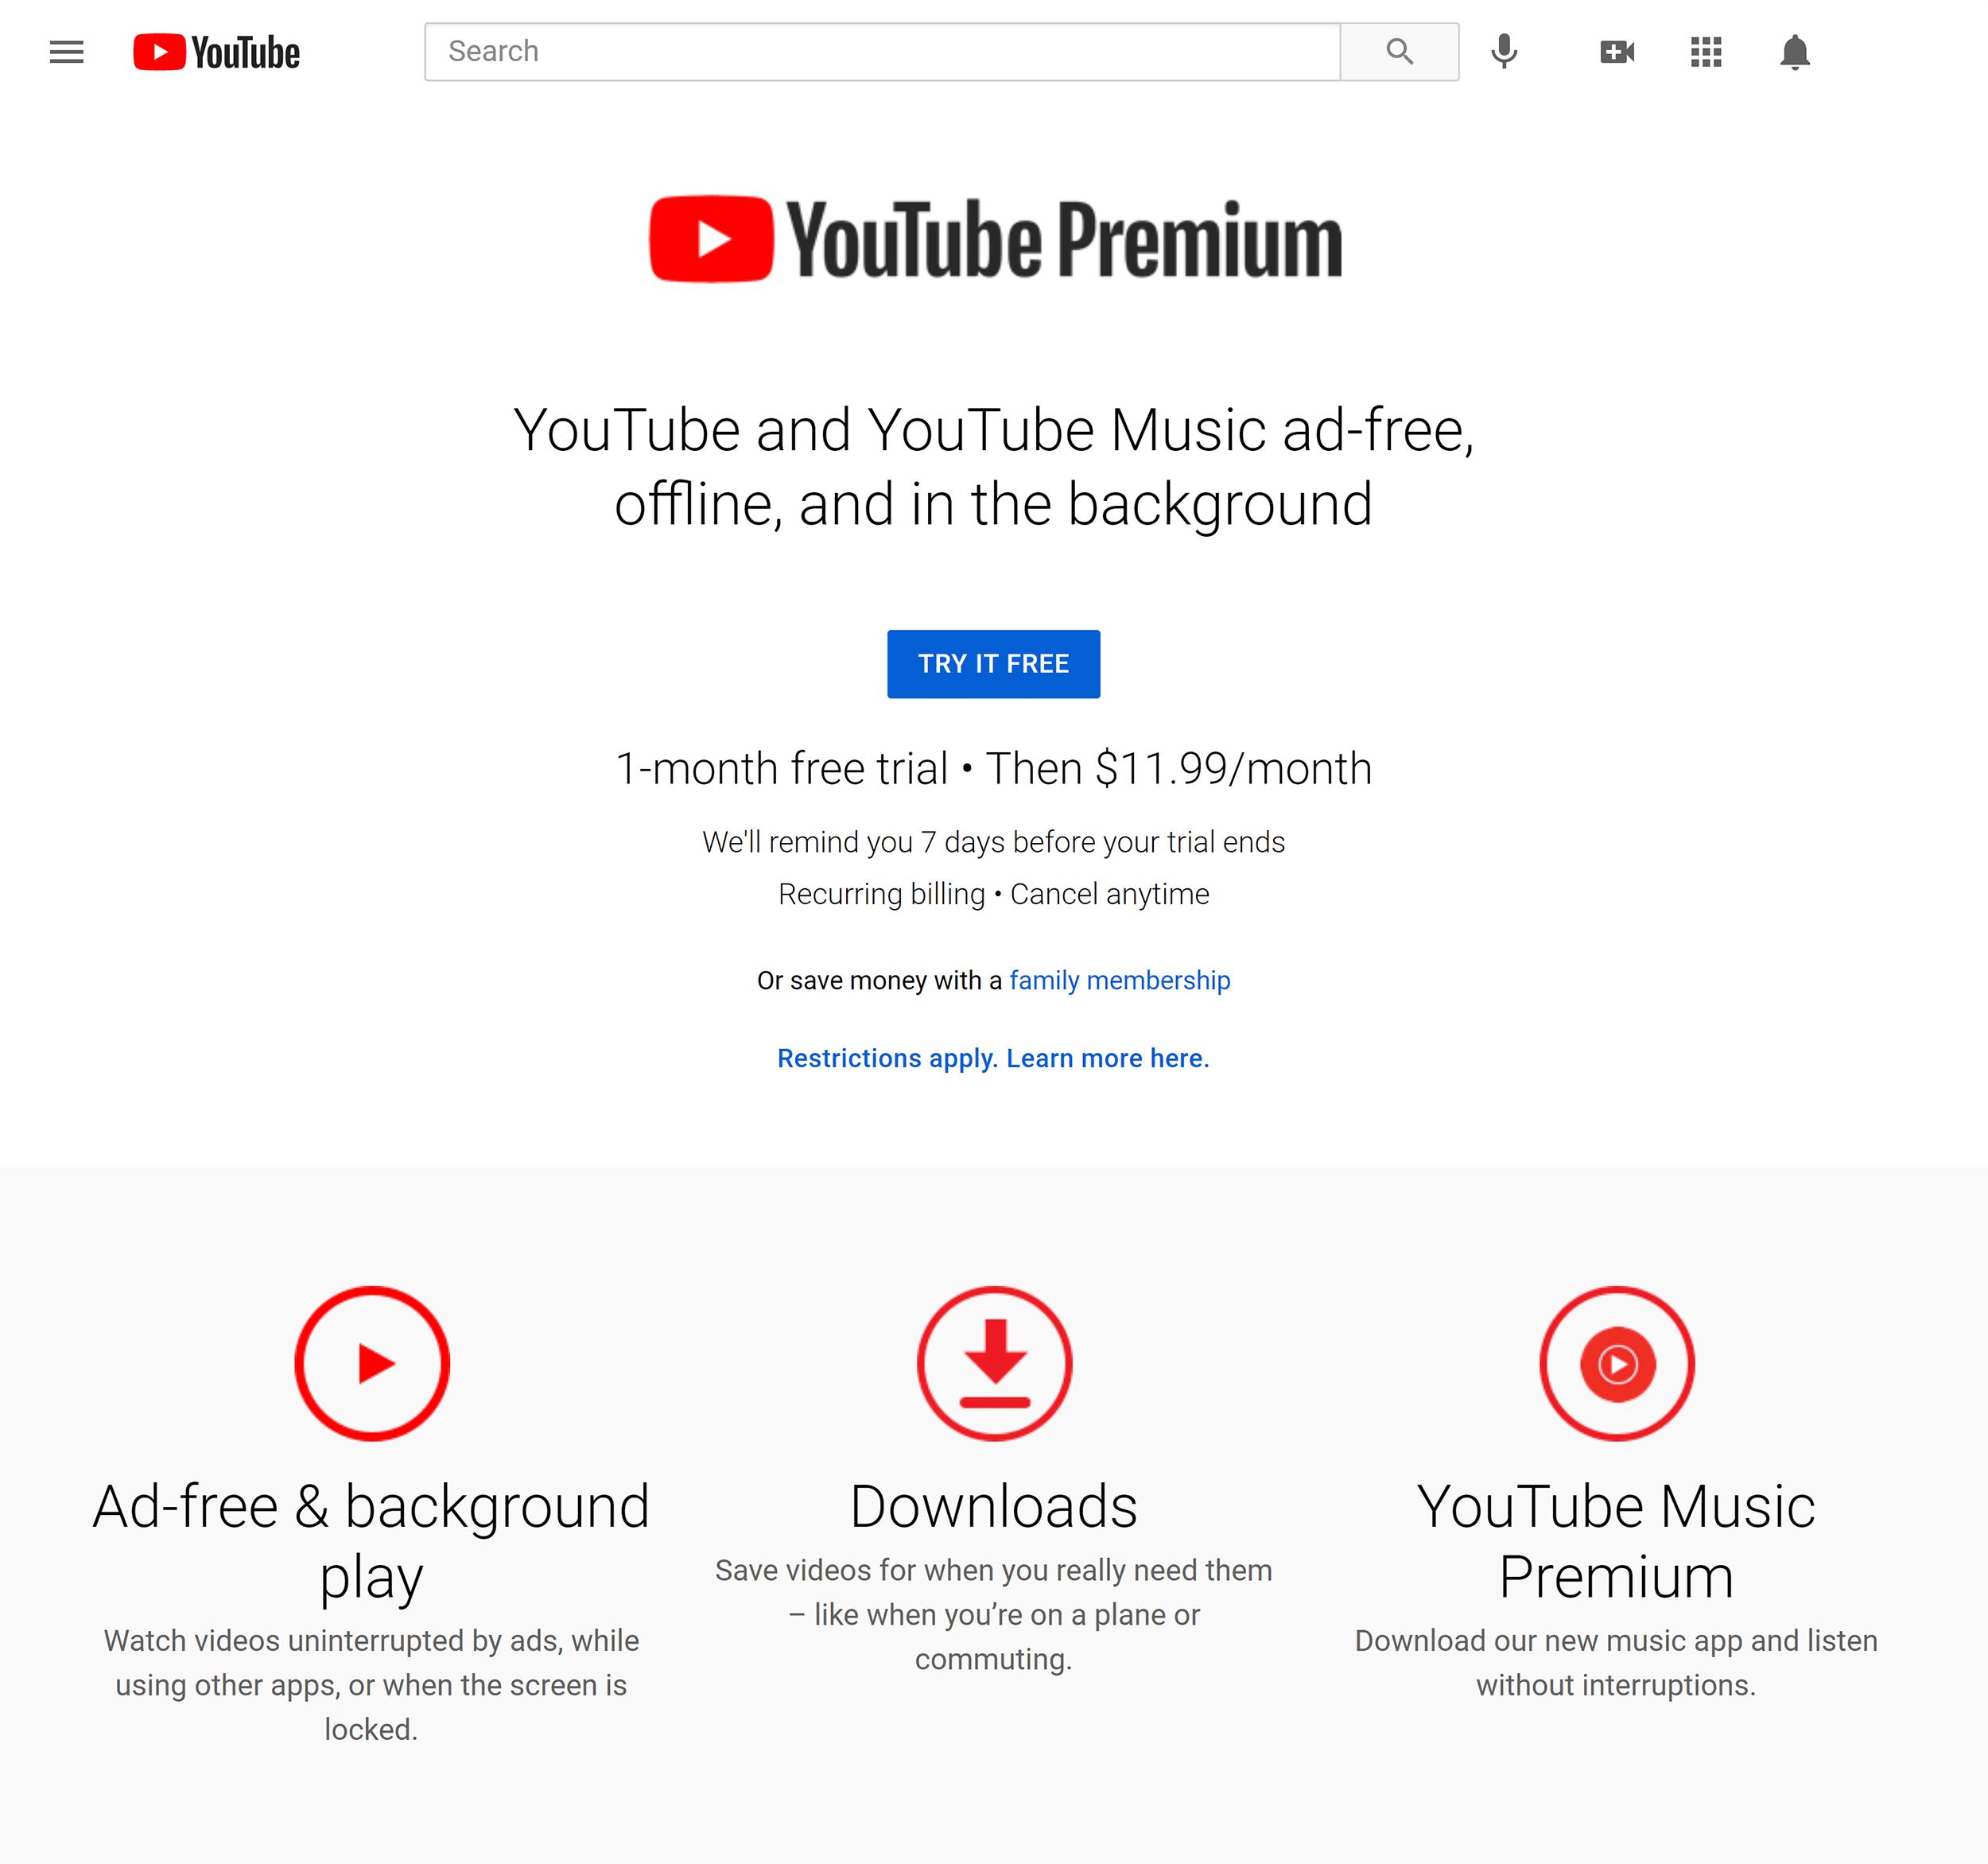 youtube-premium-min.png